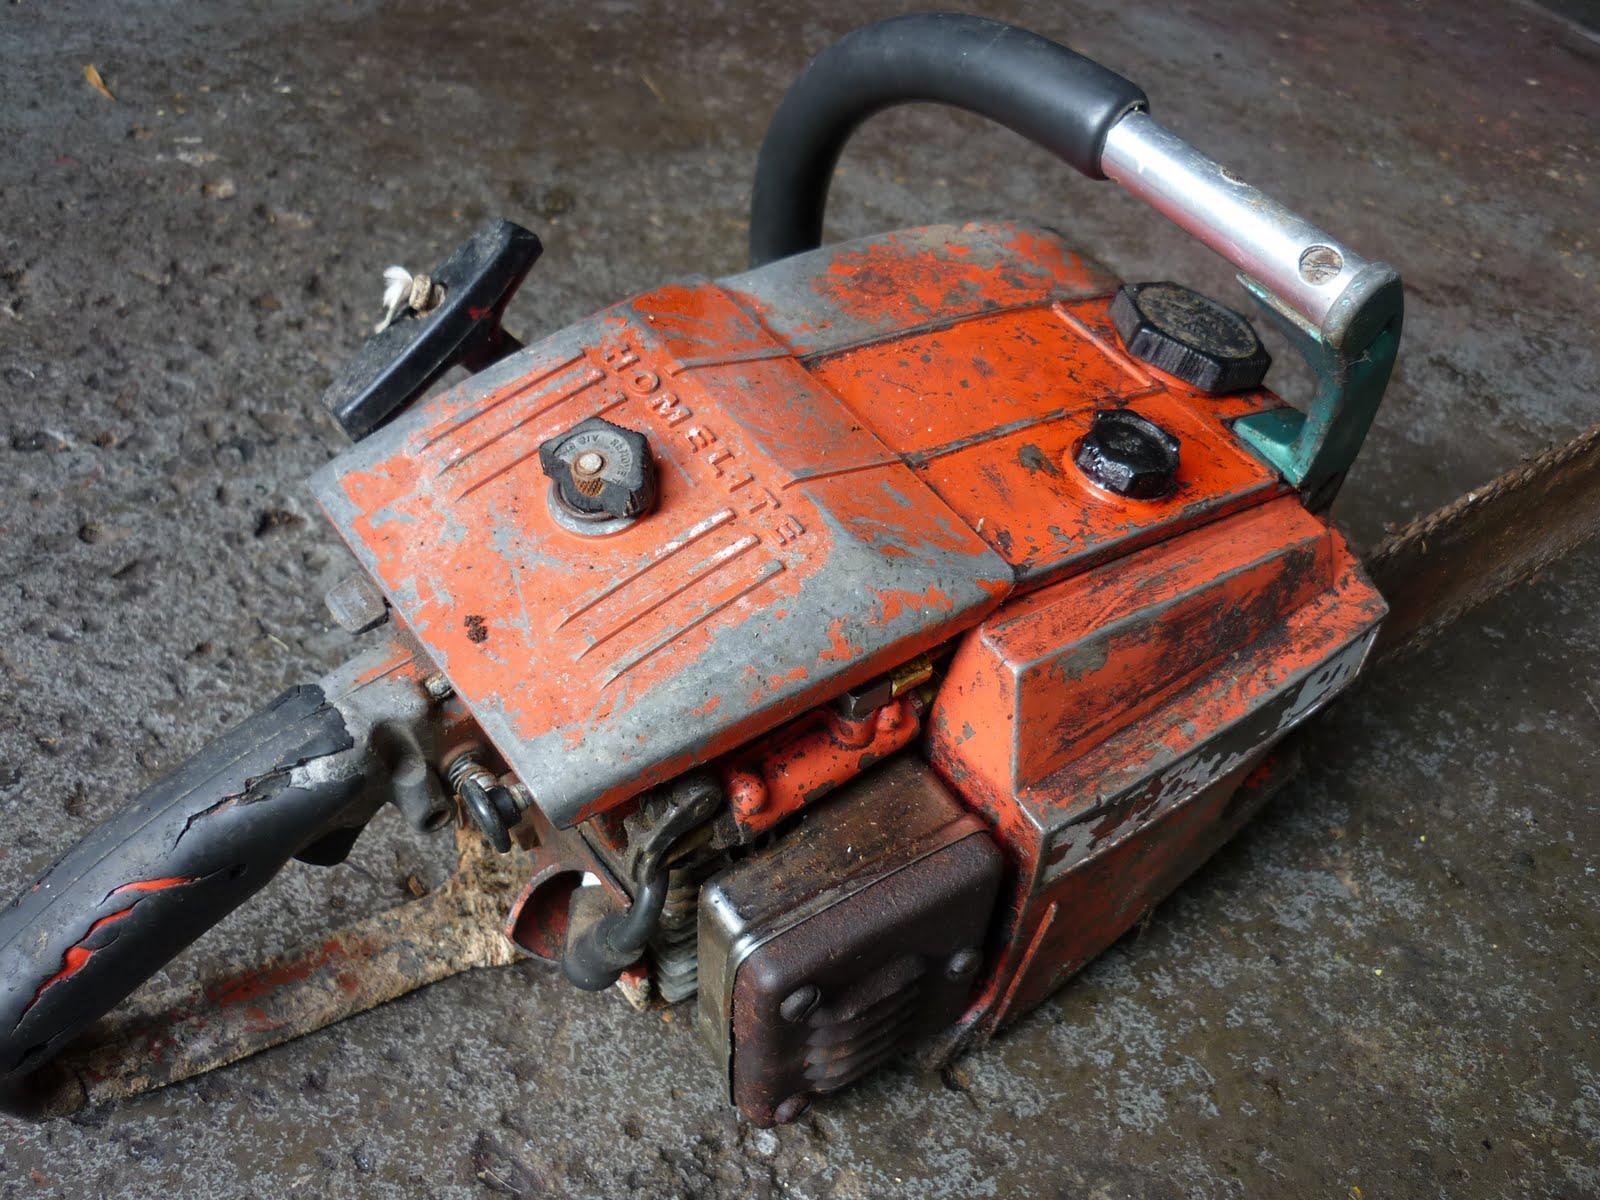 homelite chainsaw. homelite xl 902am. homelite chainsaw t